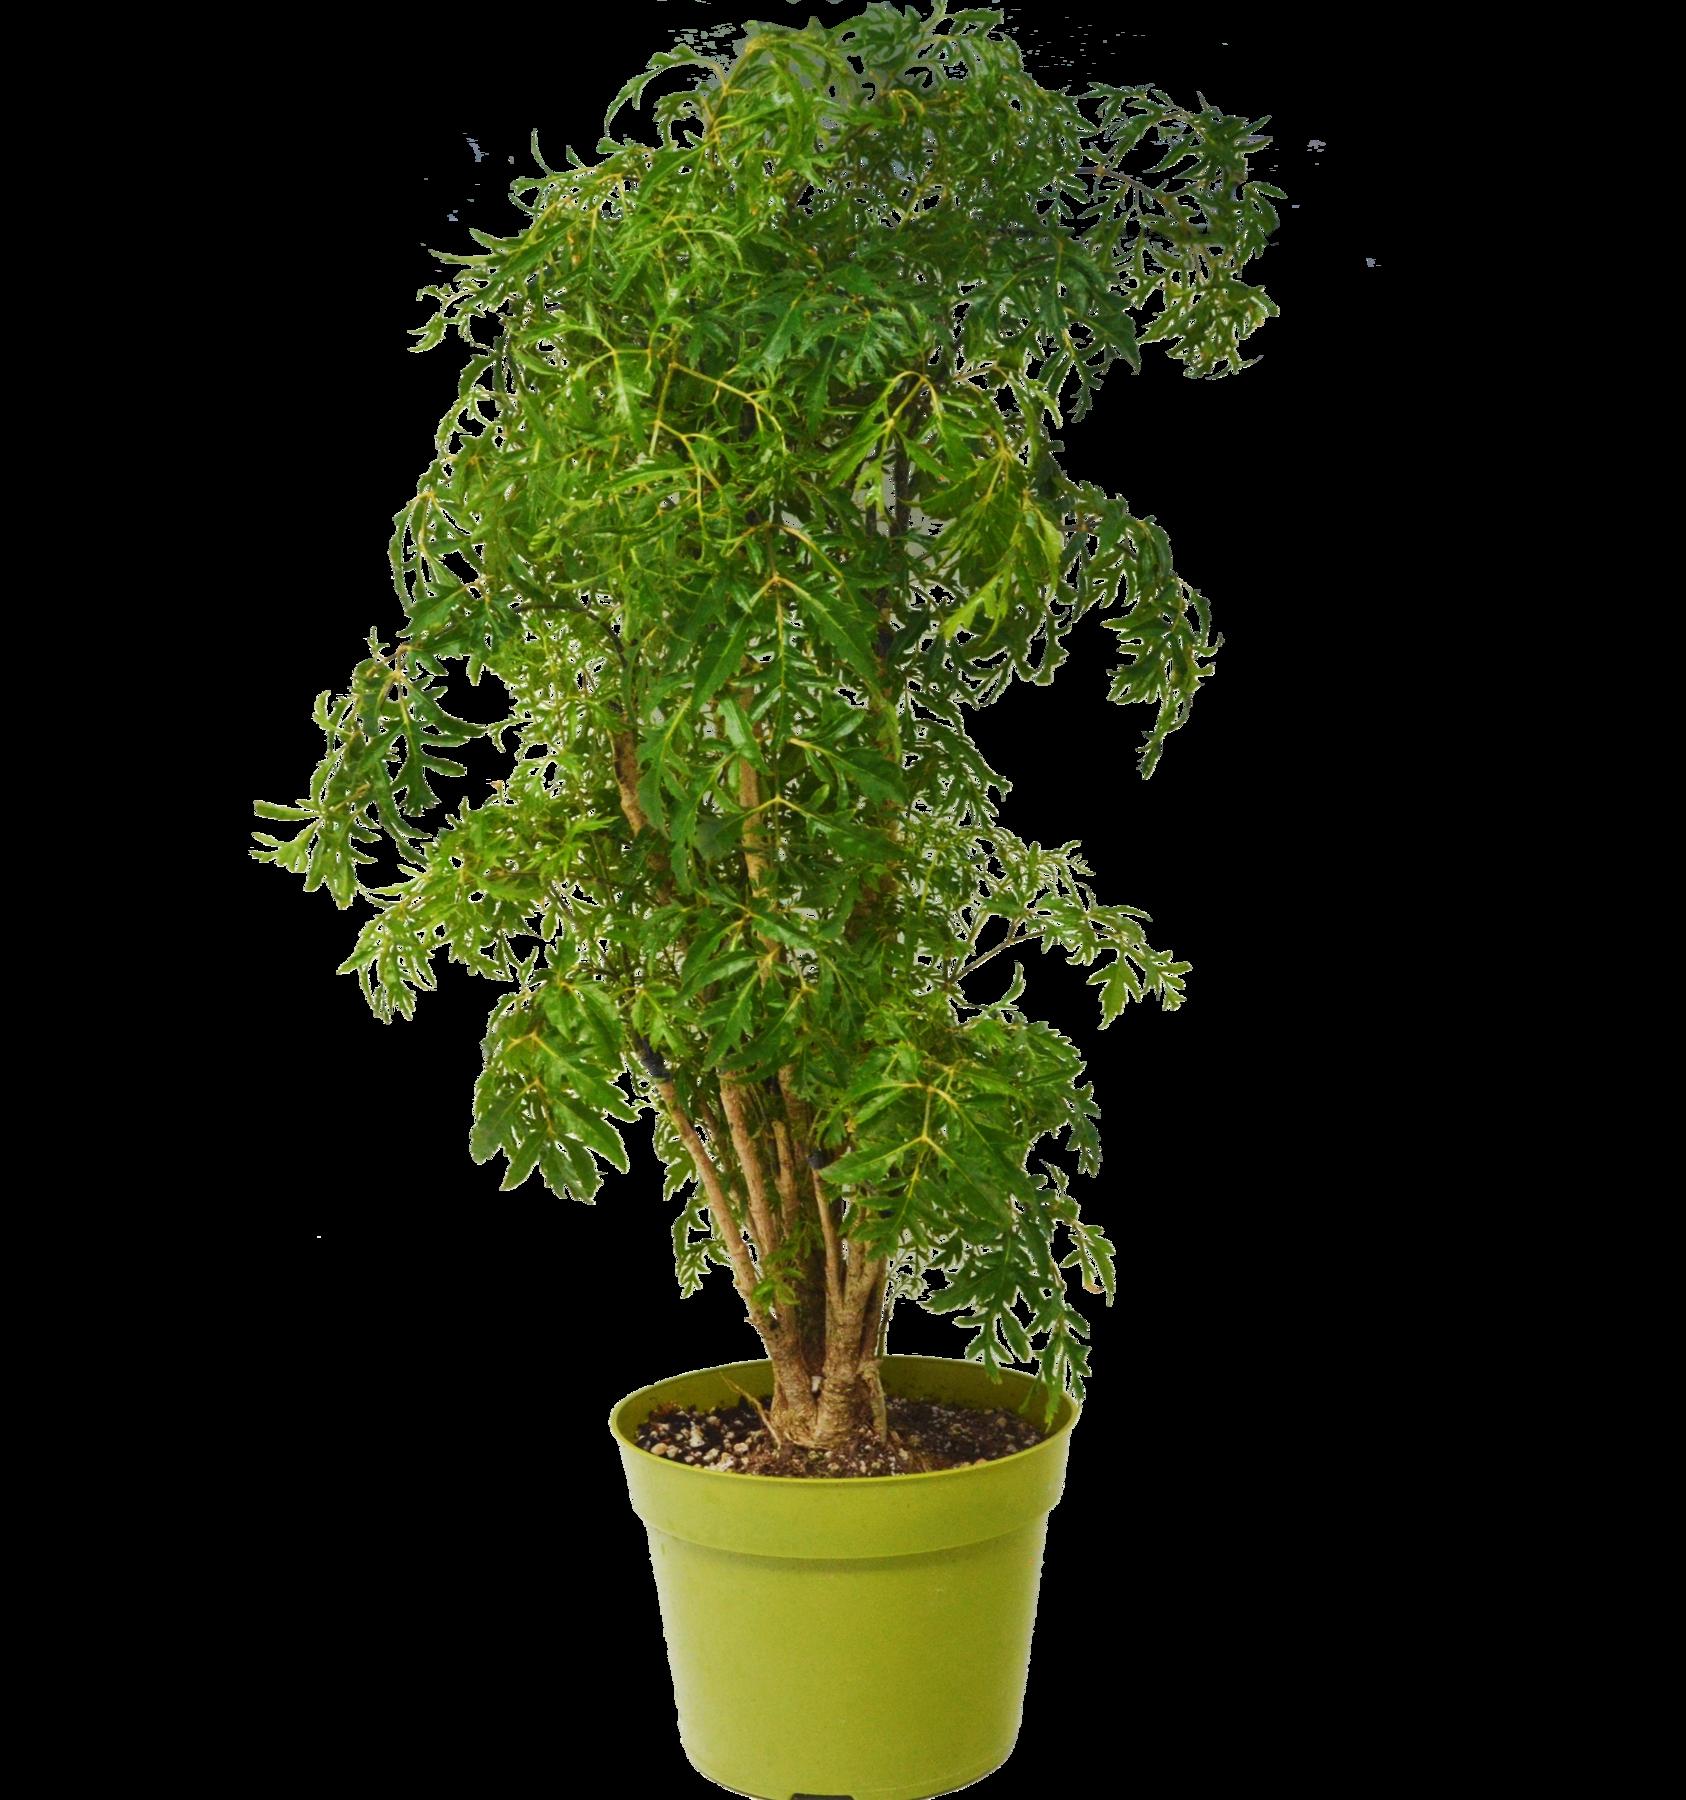 Aralia Ming Stump Plant In 6 Pot Easy Care Plants Perennial